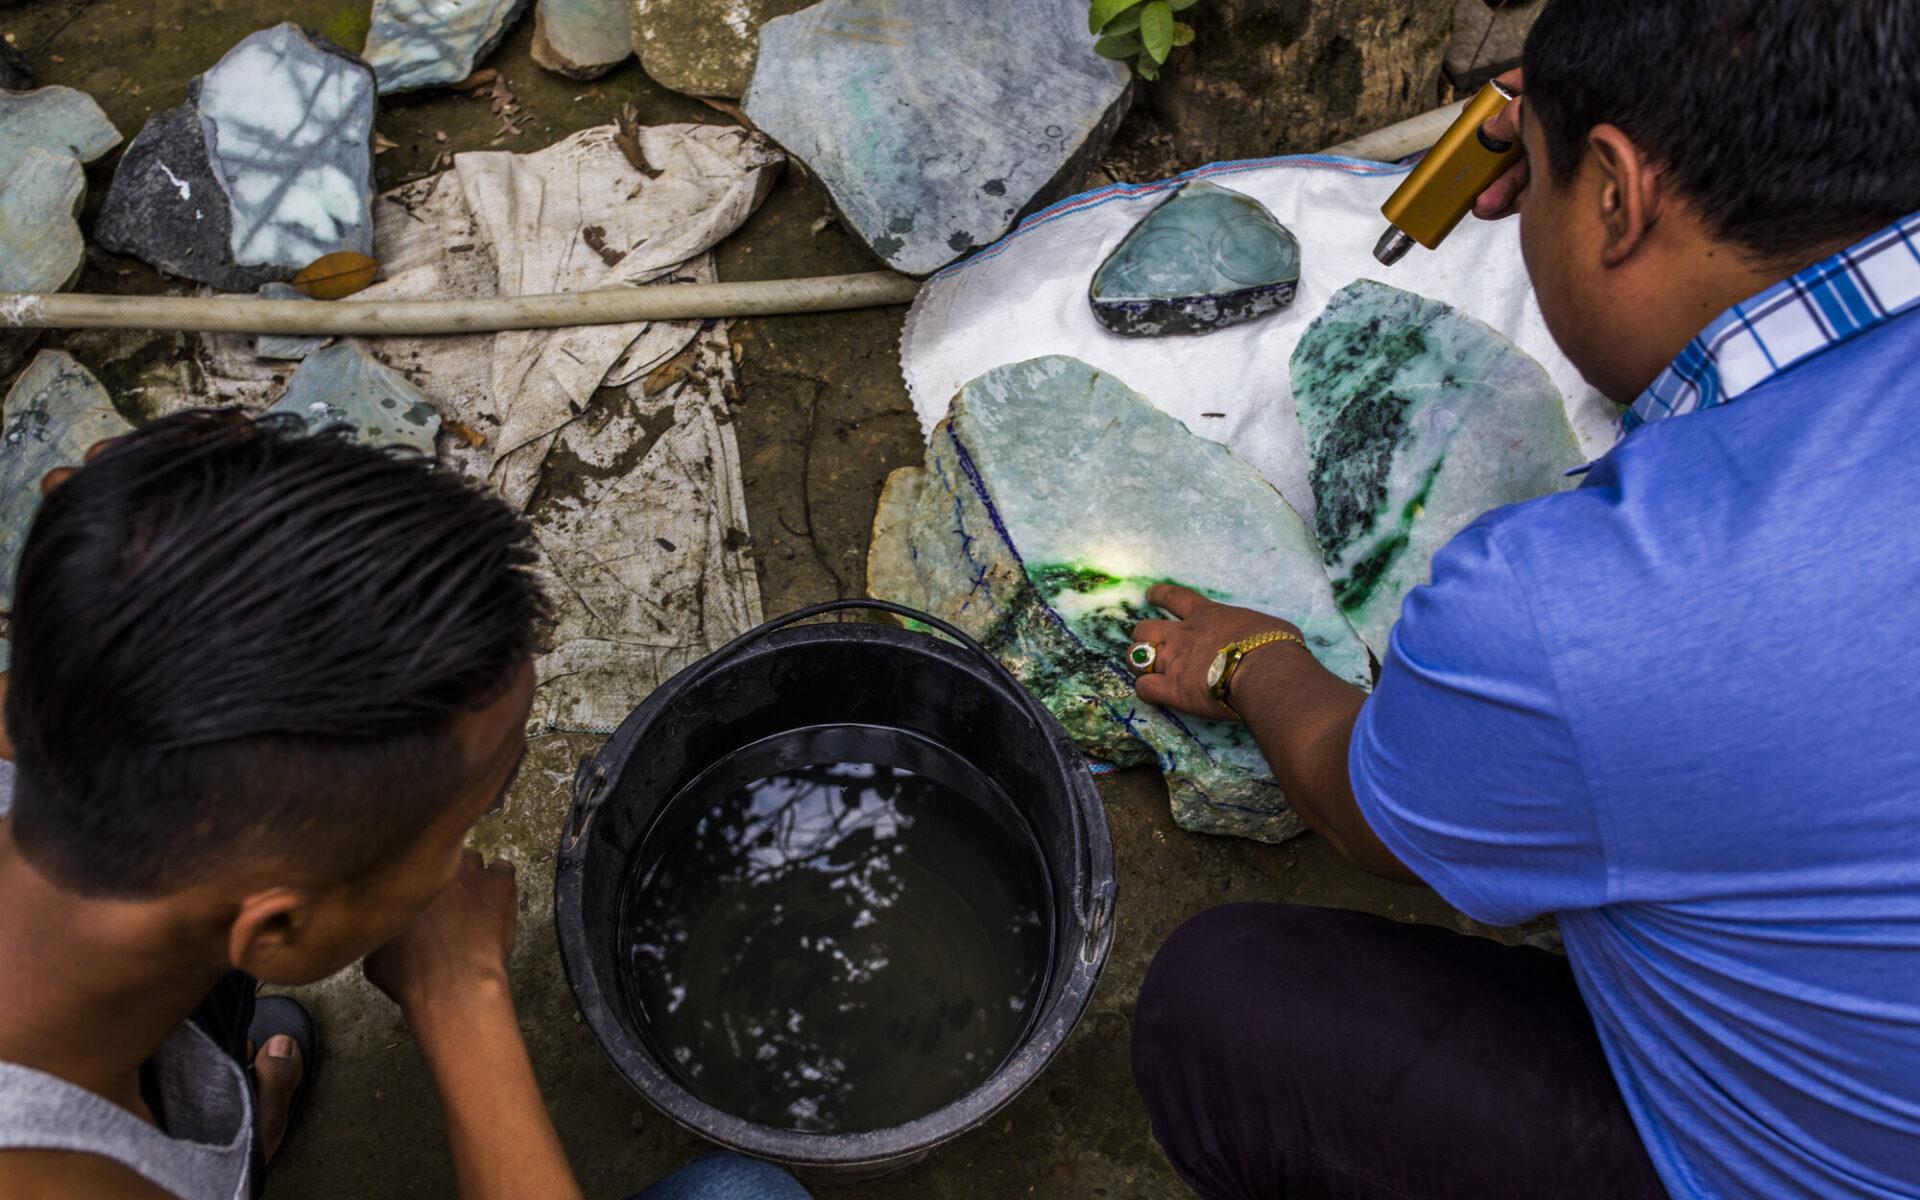 Jadehandlare i Myanmar